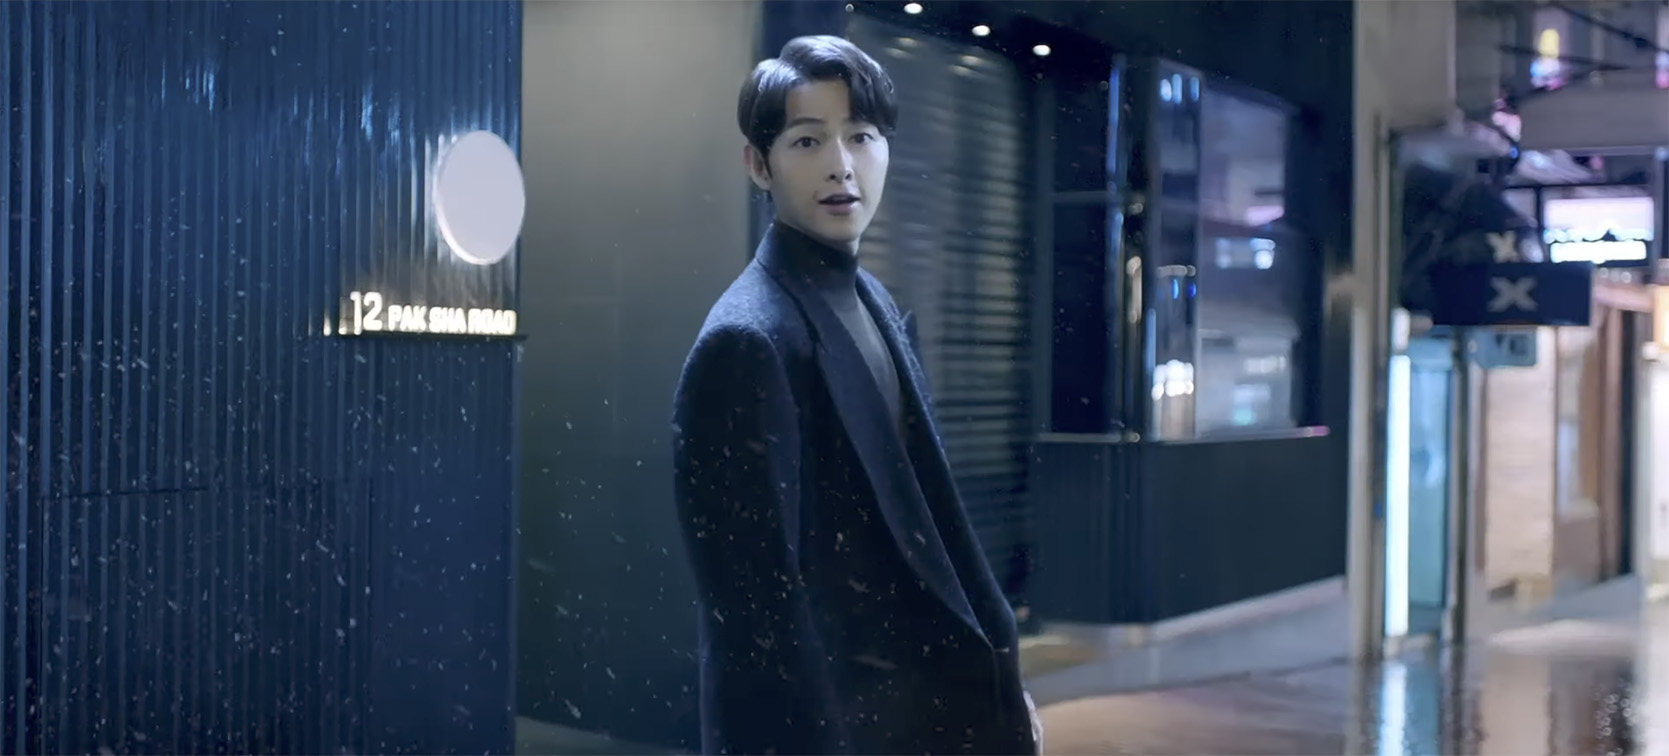 Standard Chartered, Cathay and Mastercard have launched a new campaign starring South Korean actor Song Joong-Ki via TBWA\Hong Kong